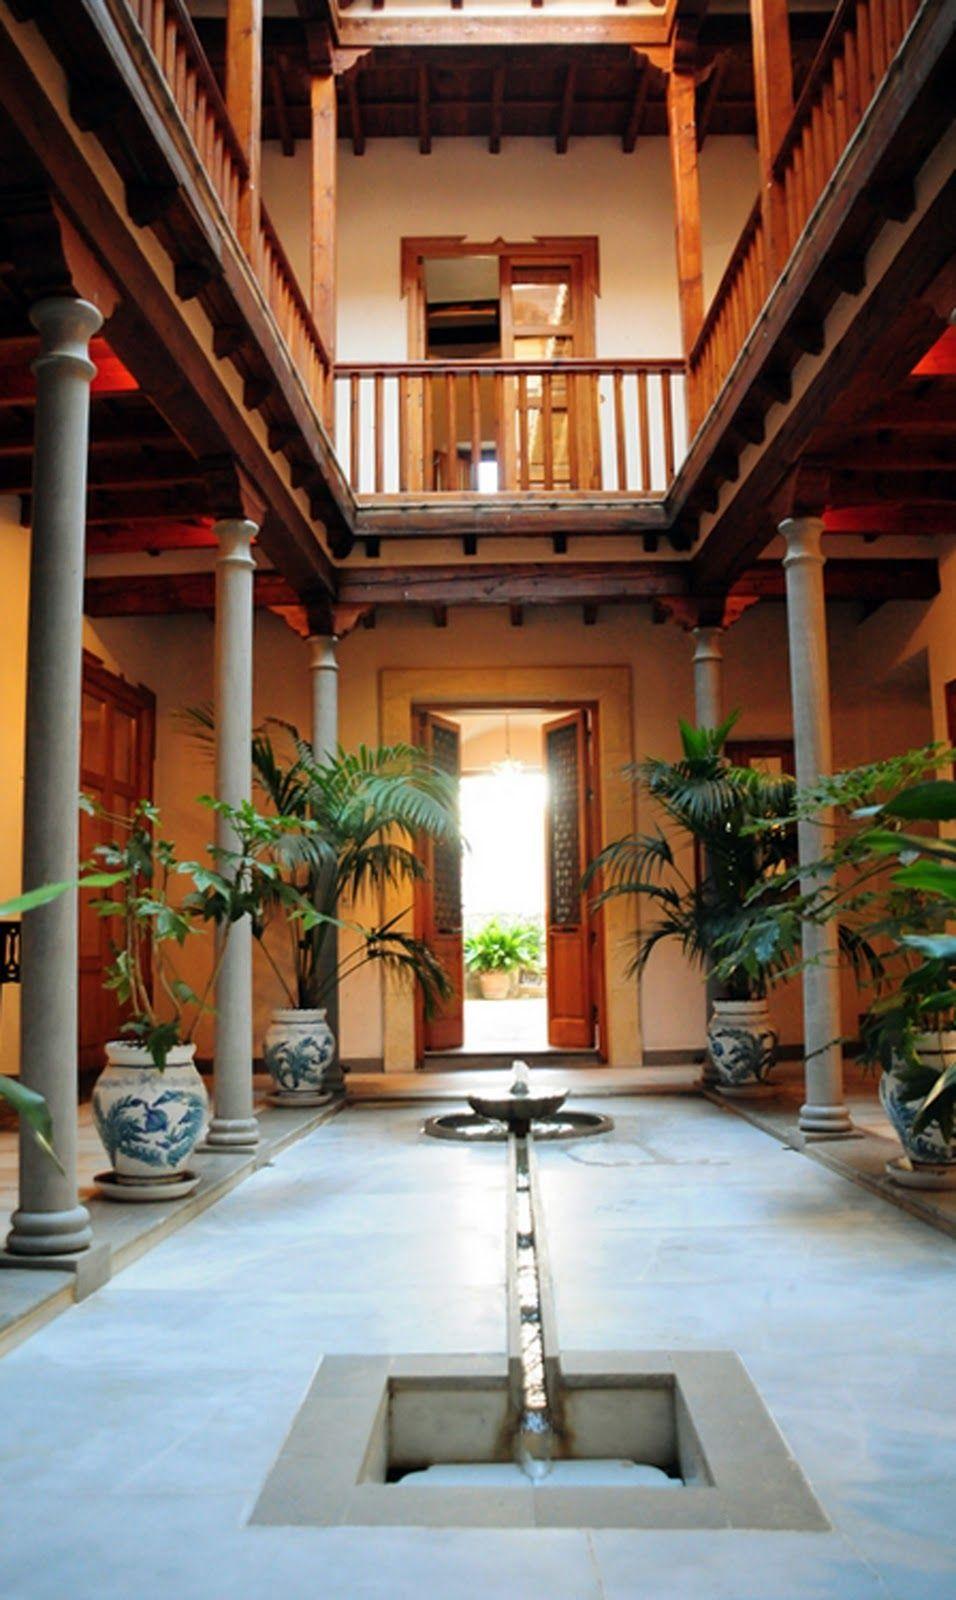 PATIOS | Kerala house design, Traditional house plans ...